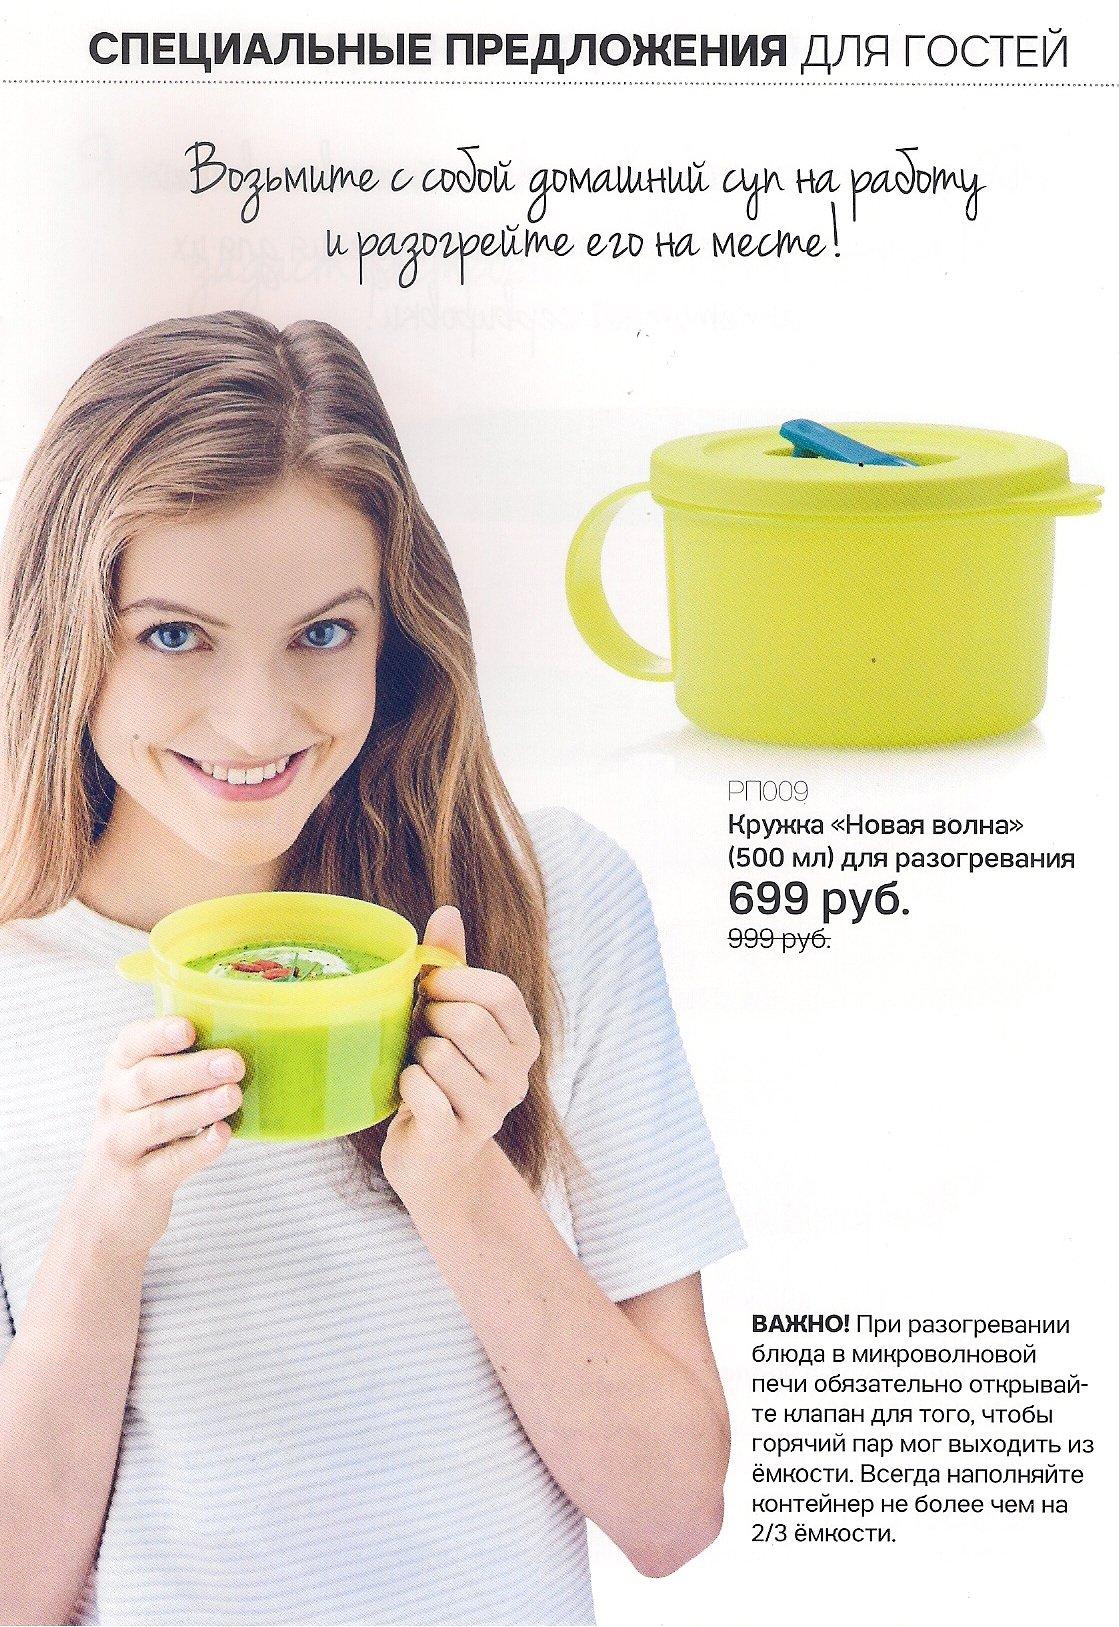 http://tupperware-online.ru/images/upload/19g.jpg